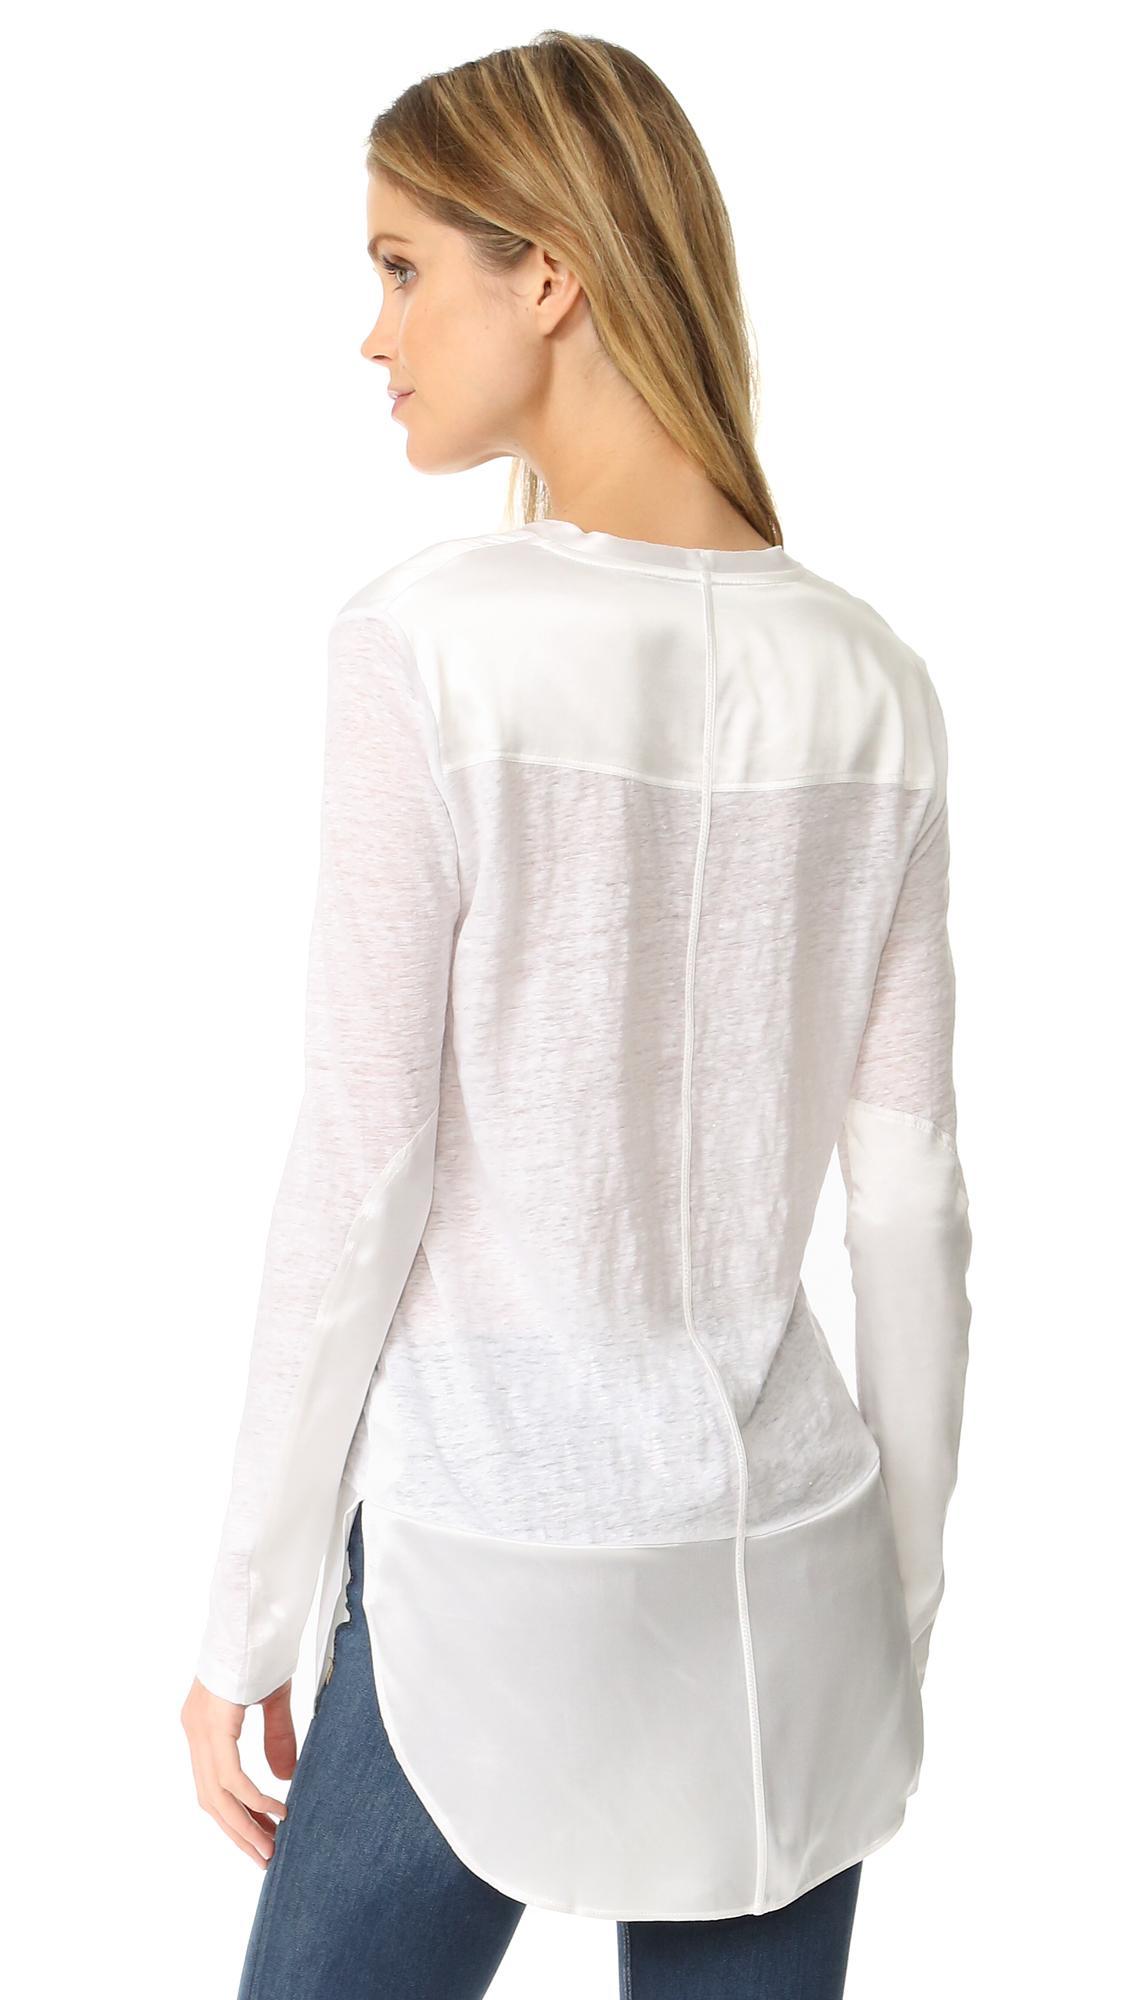 Women's White Riley Long Sleeve Tee